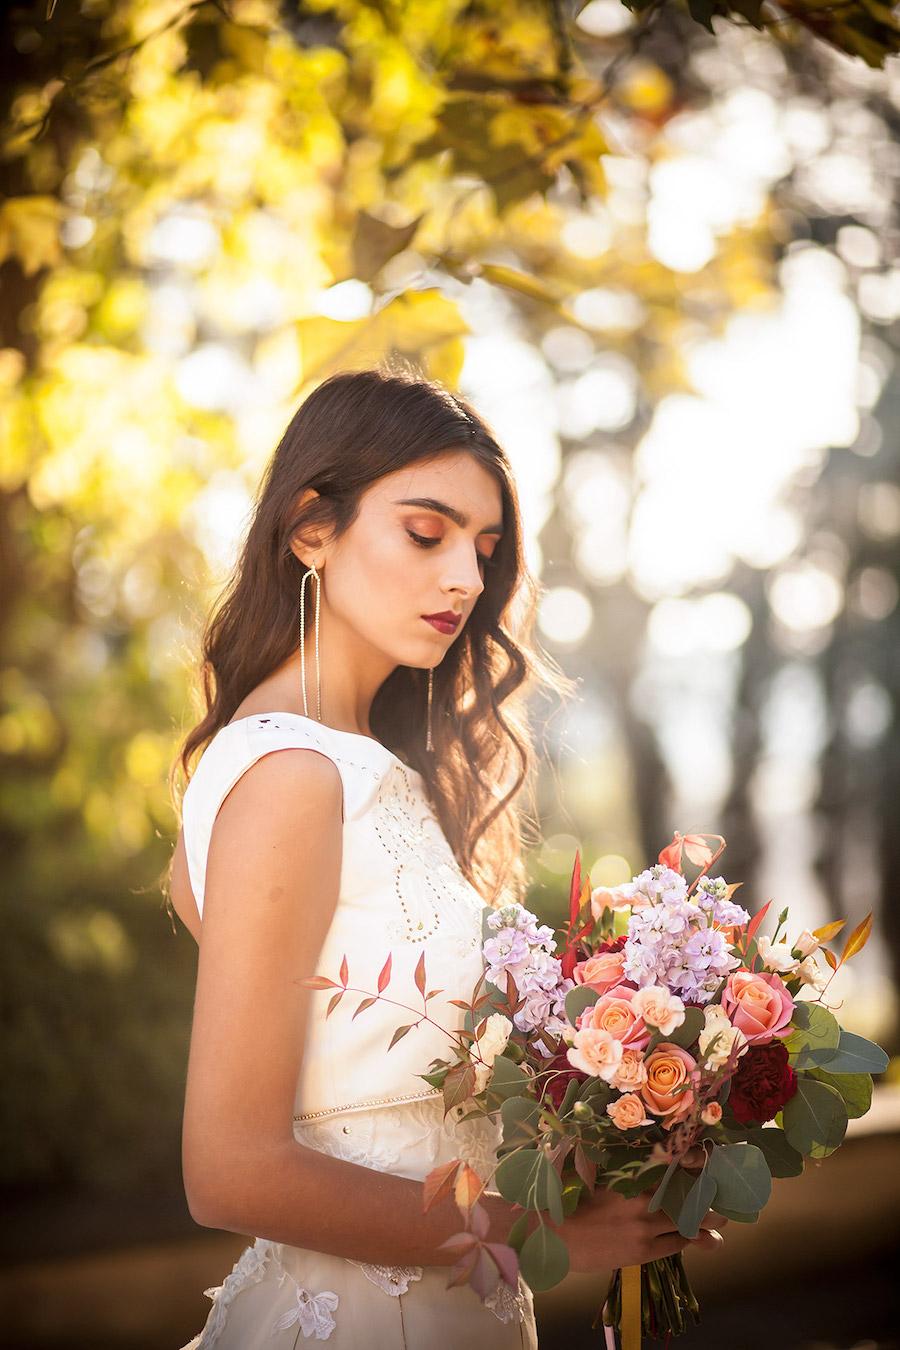 matrimonio arabeggiante in giardino